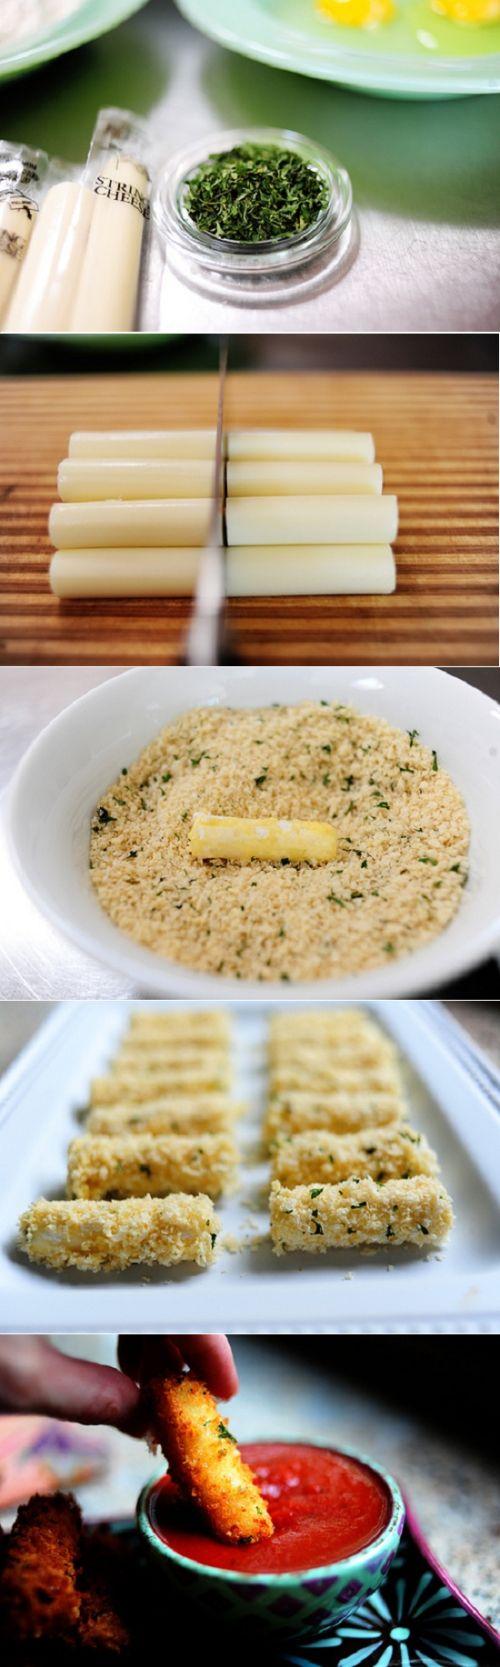 Panko bread crumbs Mozzarella Sticks Recipe by Cupcakepedia, appertizer, food, snack